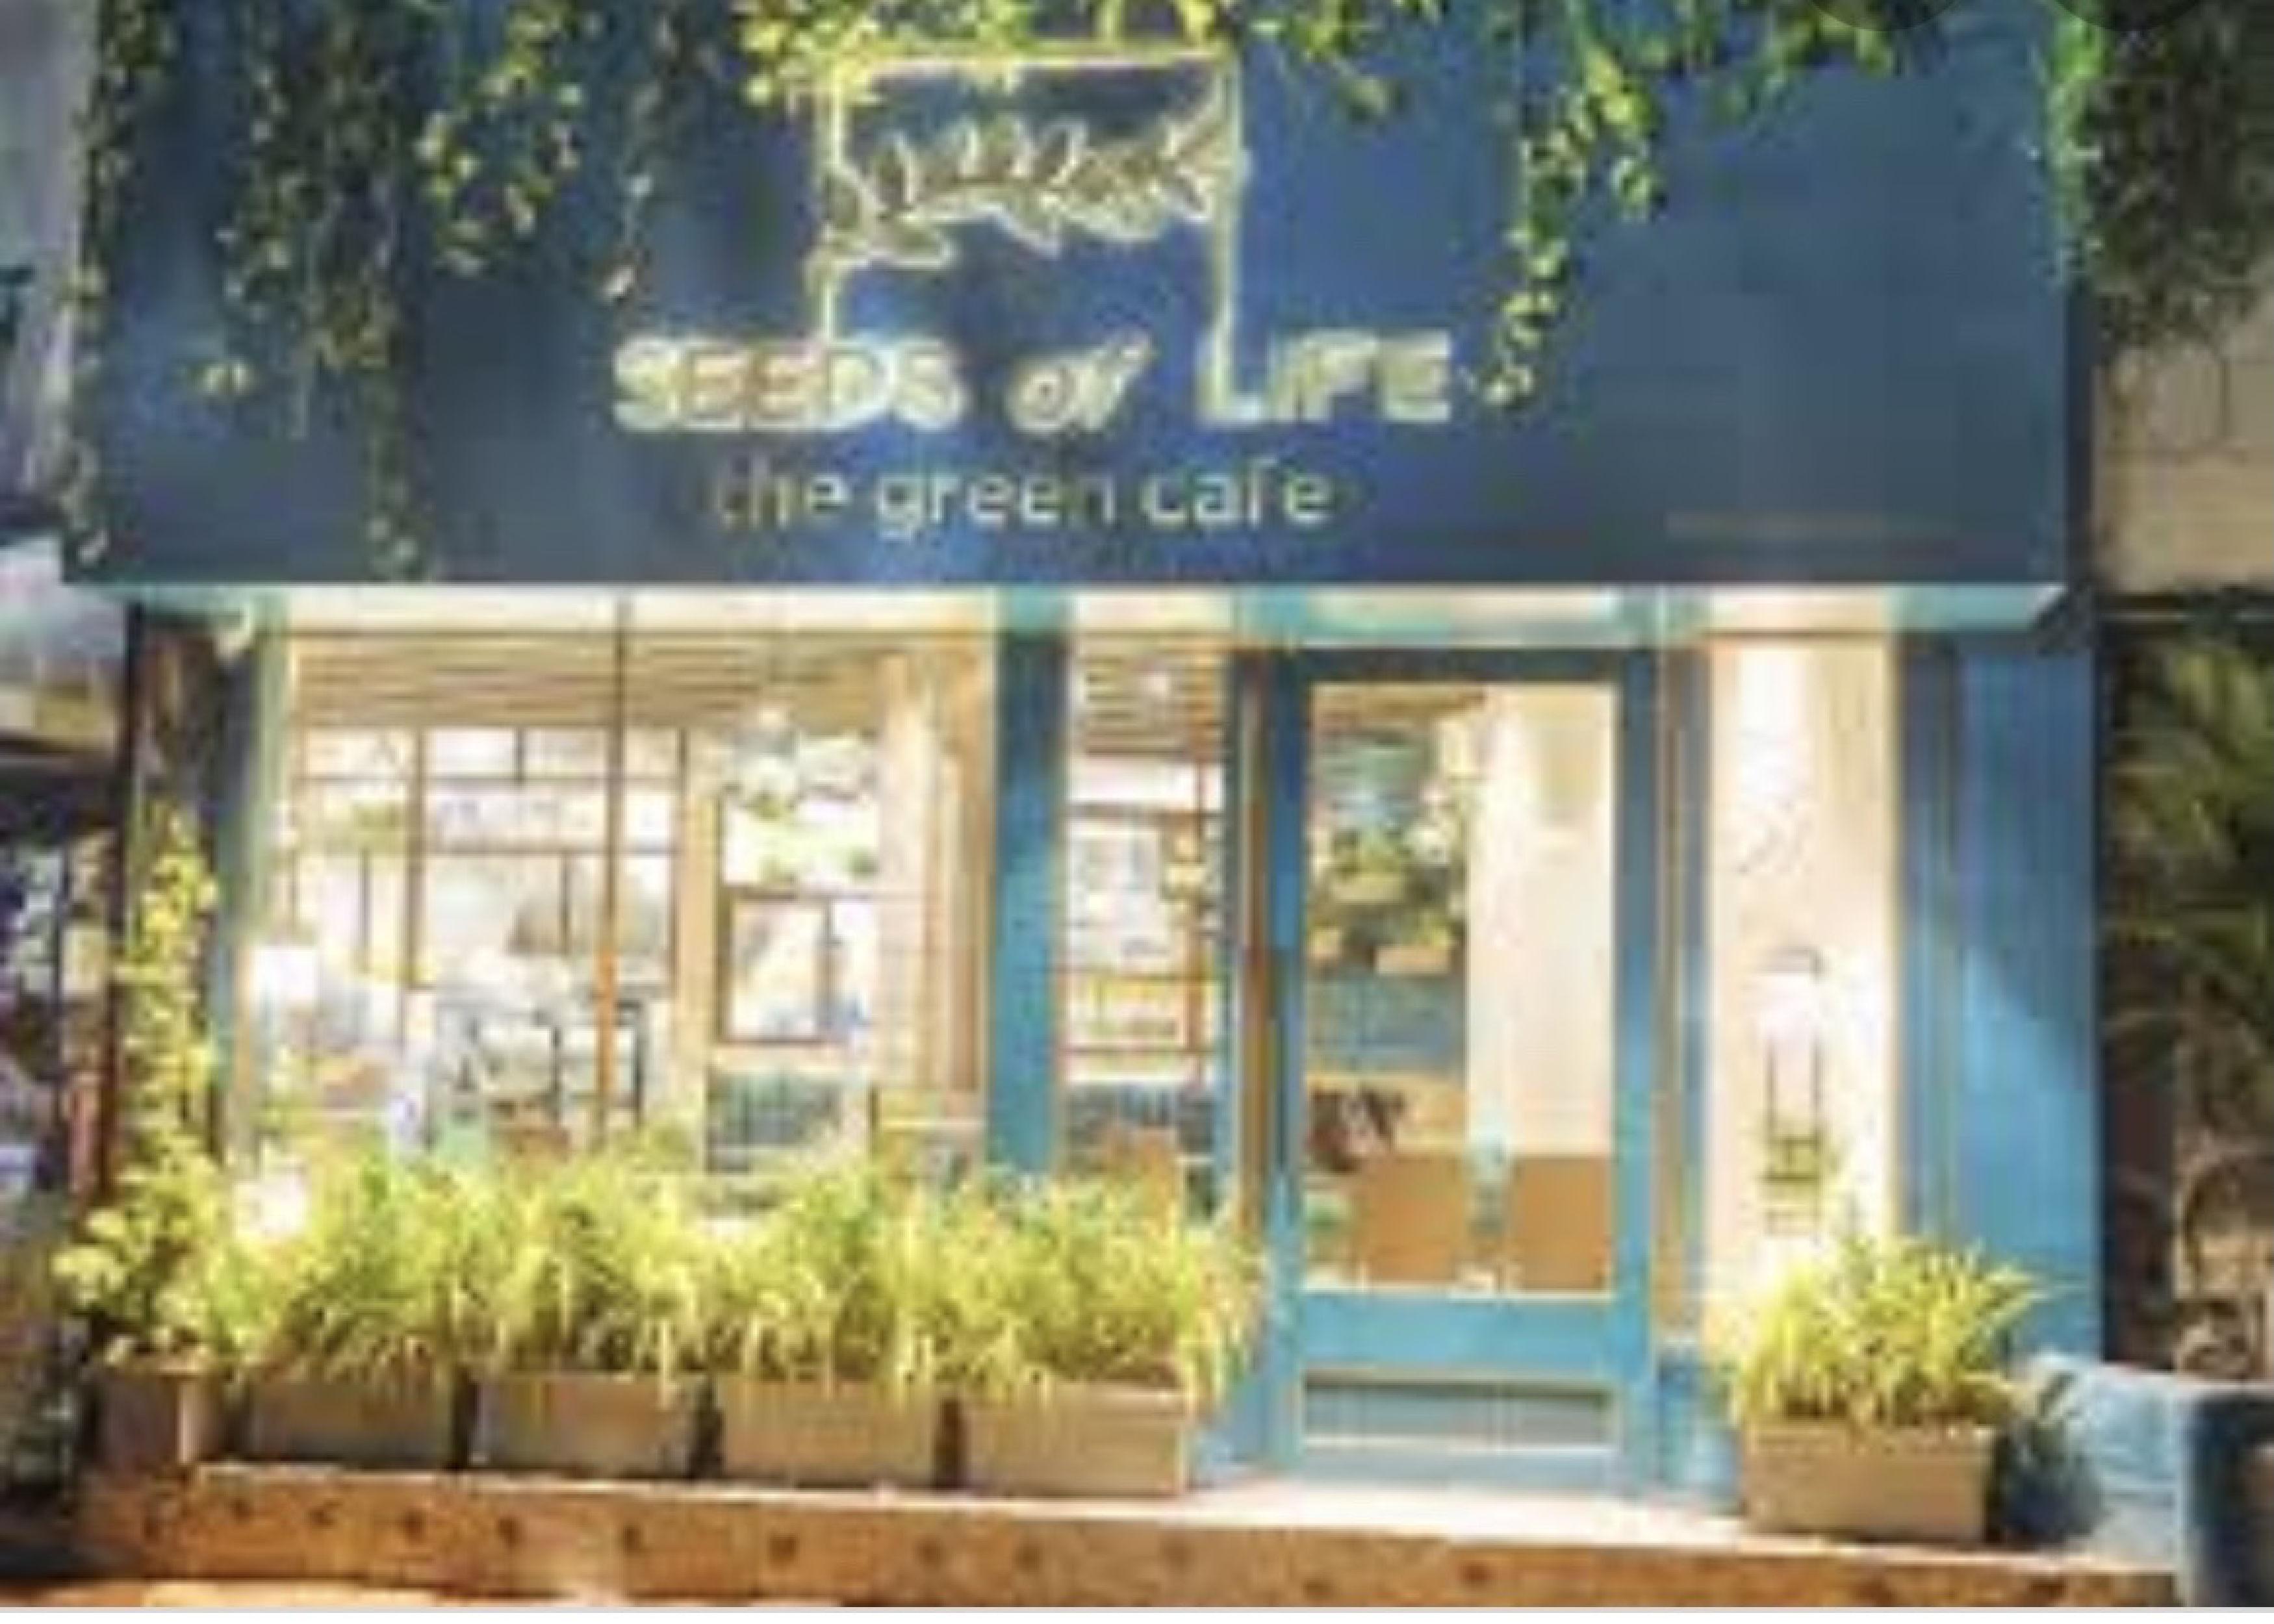 Seeds of life is a very popular vegan restaurant!